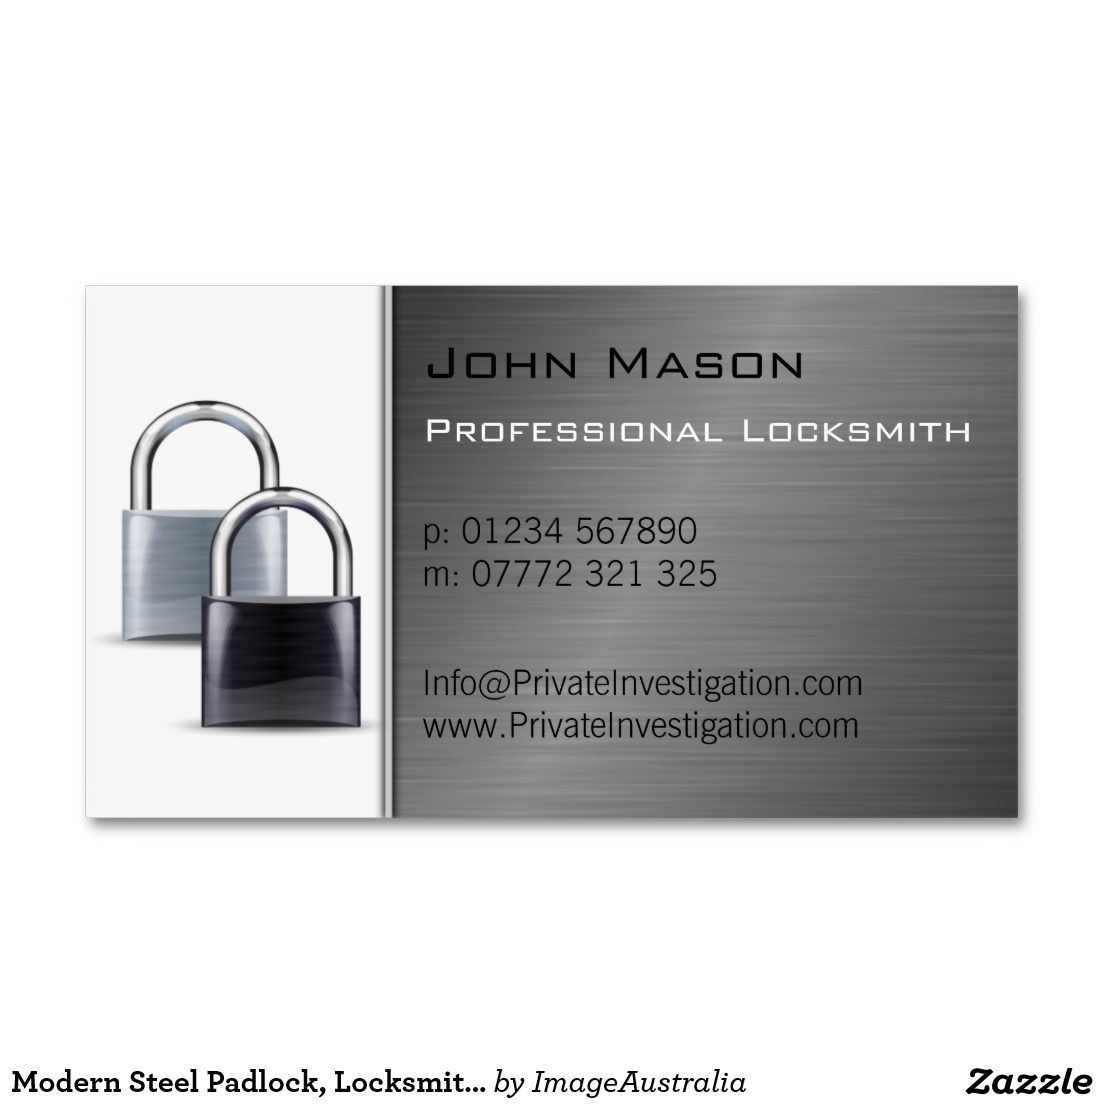 Modern Steel Padlock, Locksmith Business Card | Business cards ...